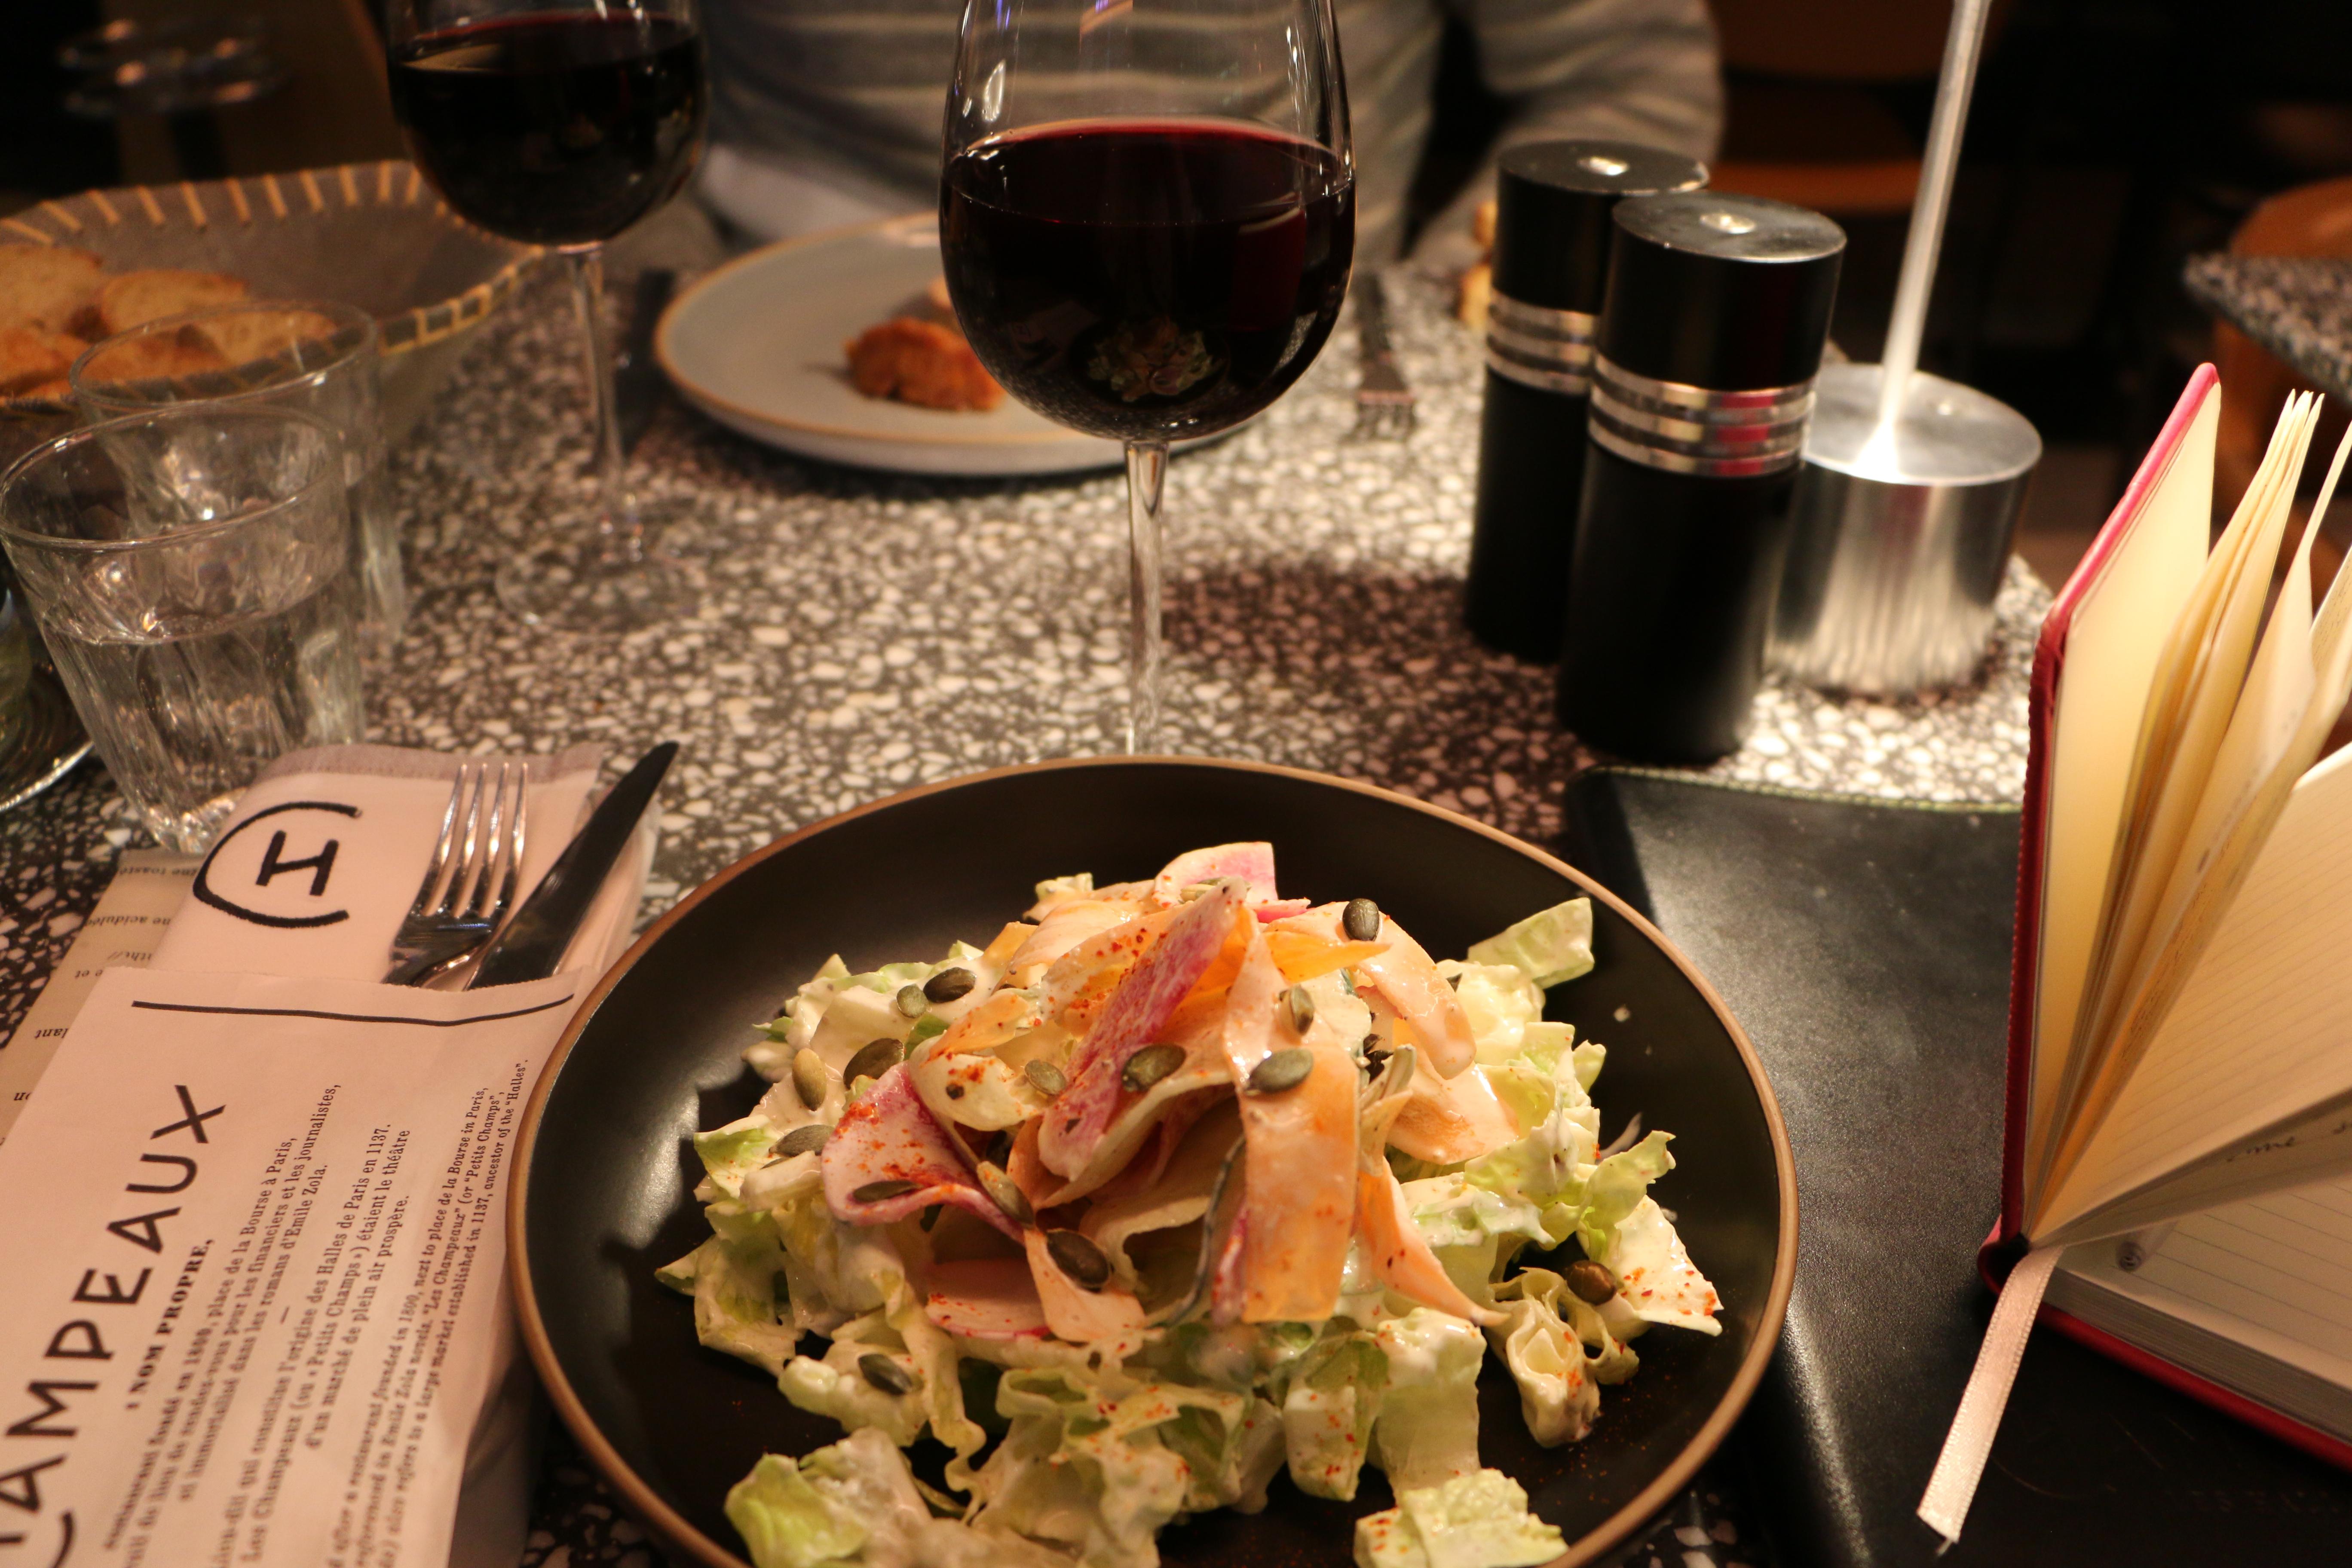 Champeaux Alain Ducasse restaurant in Paris